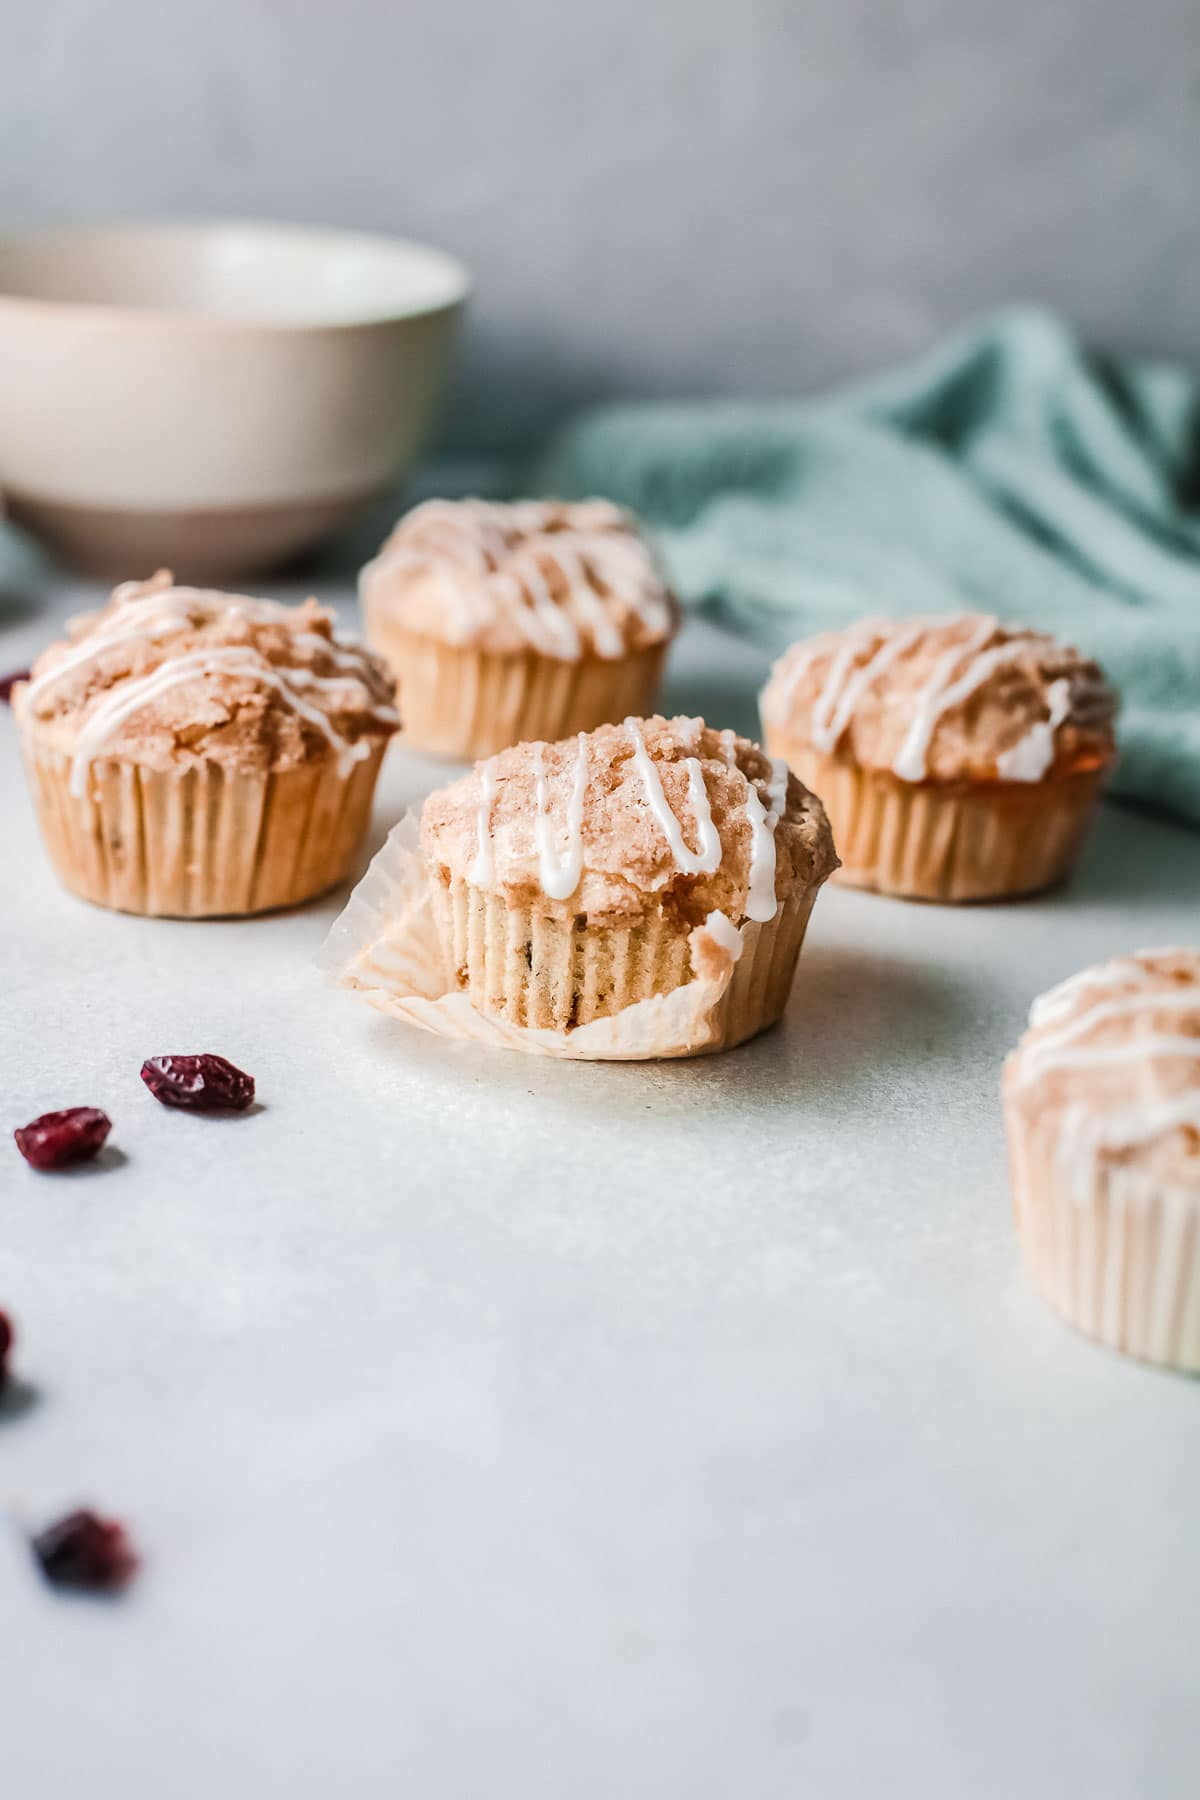 cranberry orange muffins liner removed